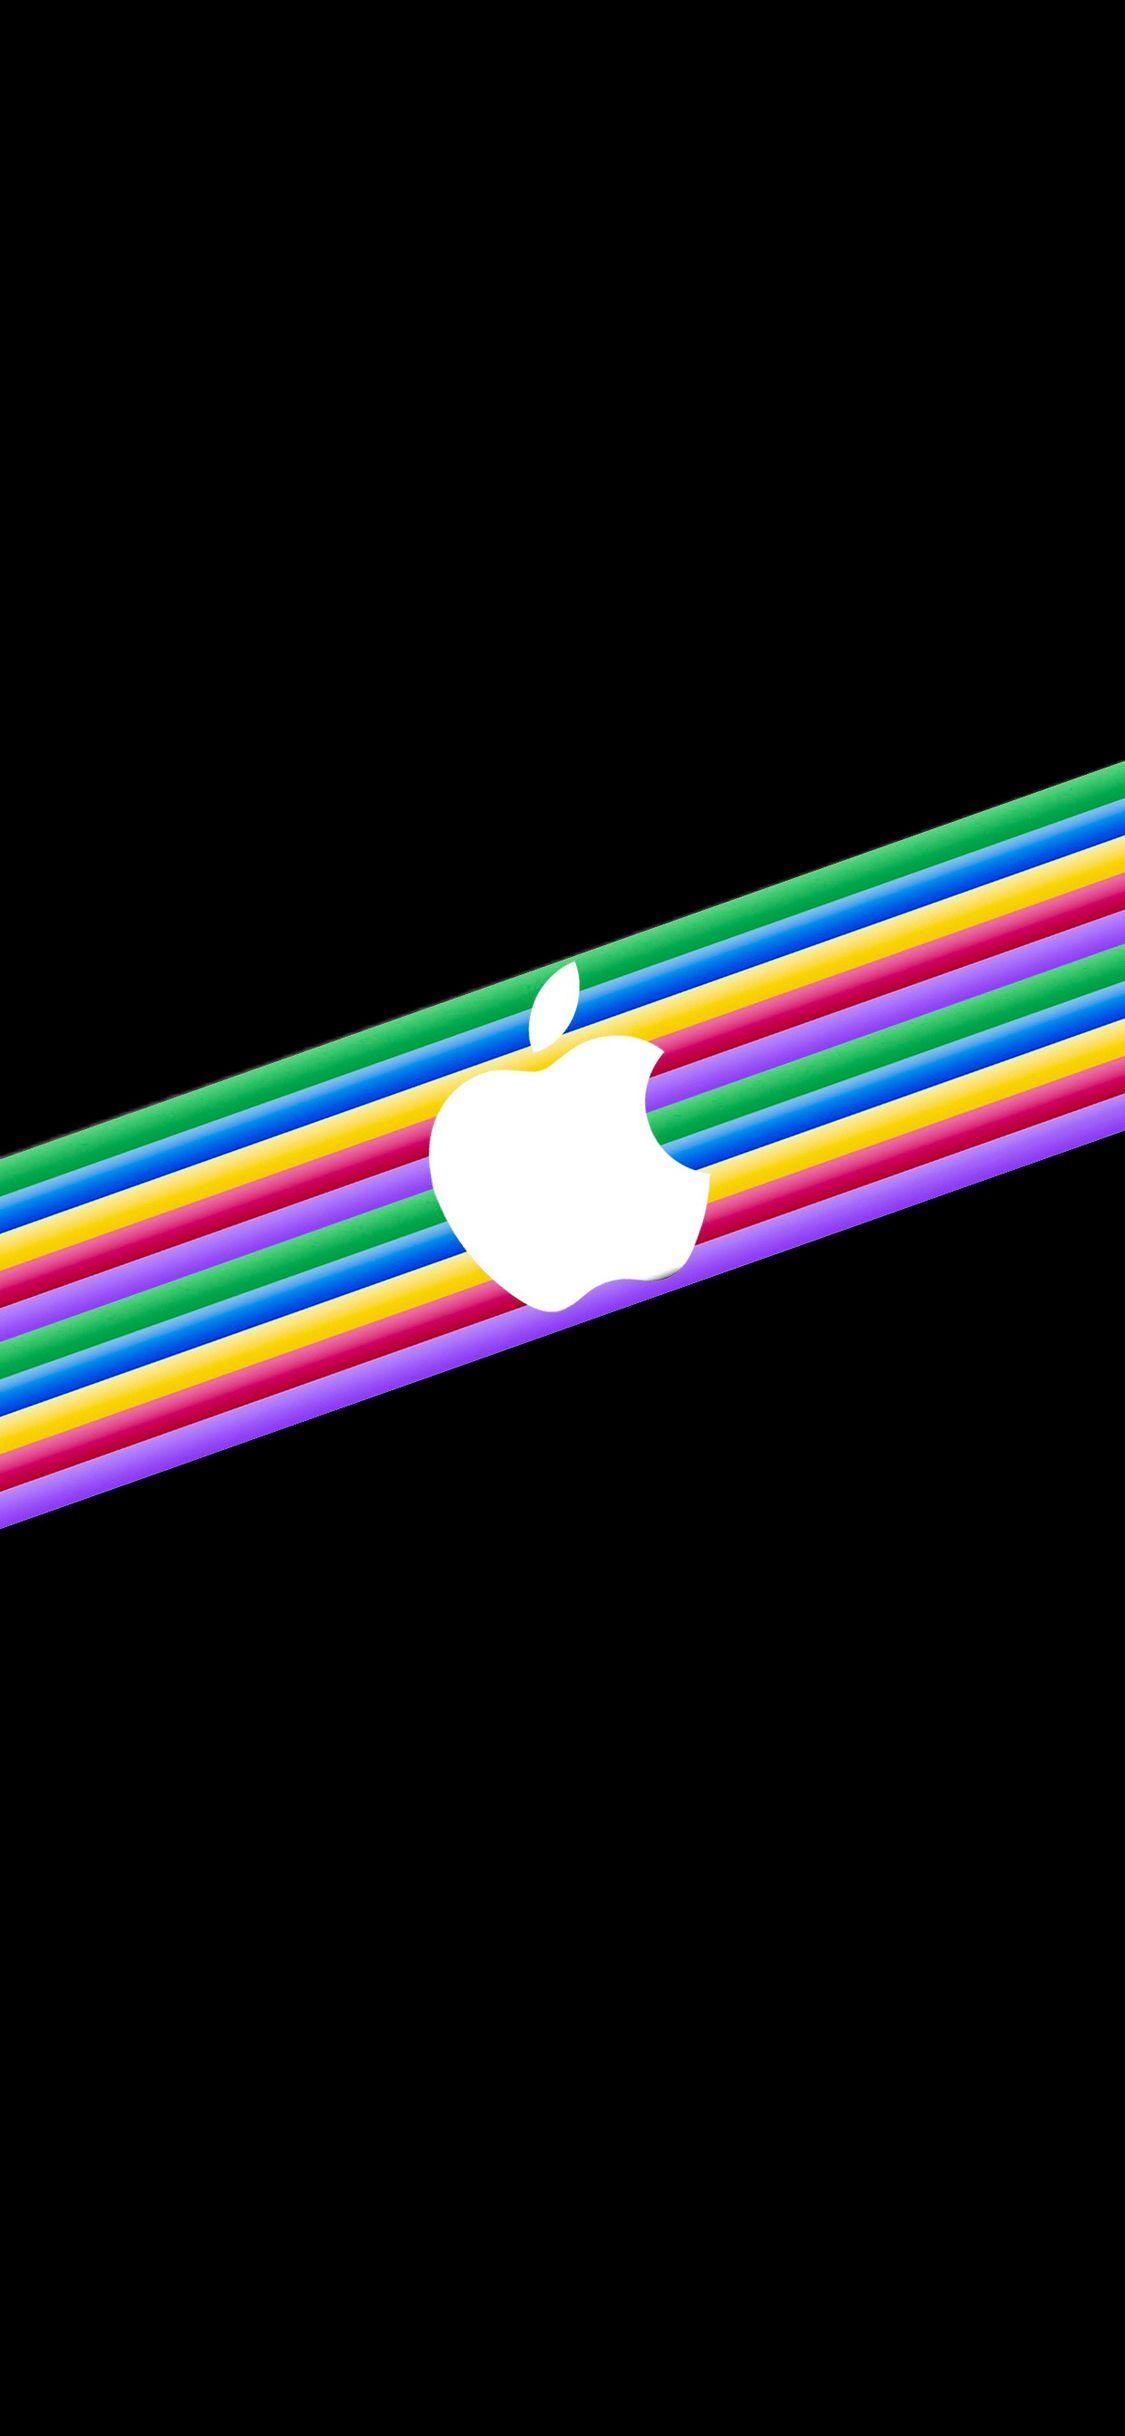 Apple Iphonewallpaper Ios13 Lockscreen Apple Wallpaper Iphone Iphone Wallpaper Hd Original Apple Logo Design